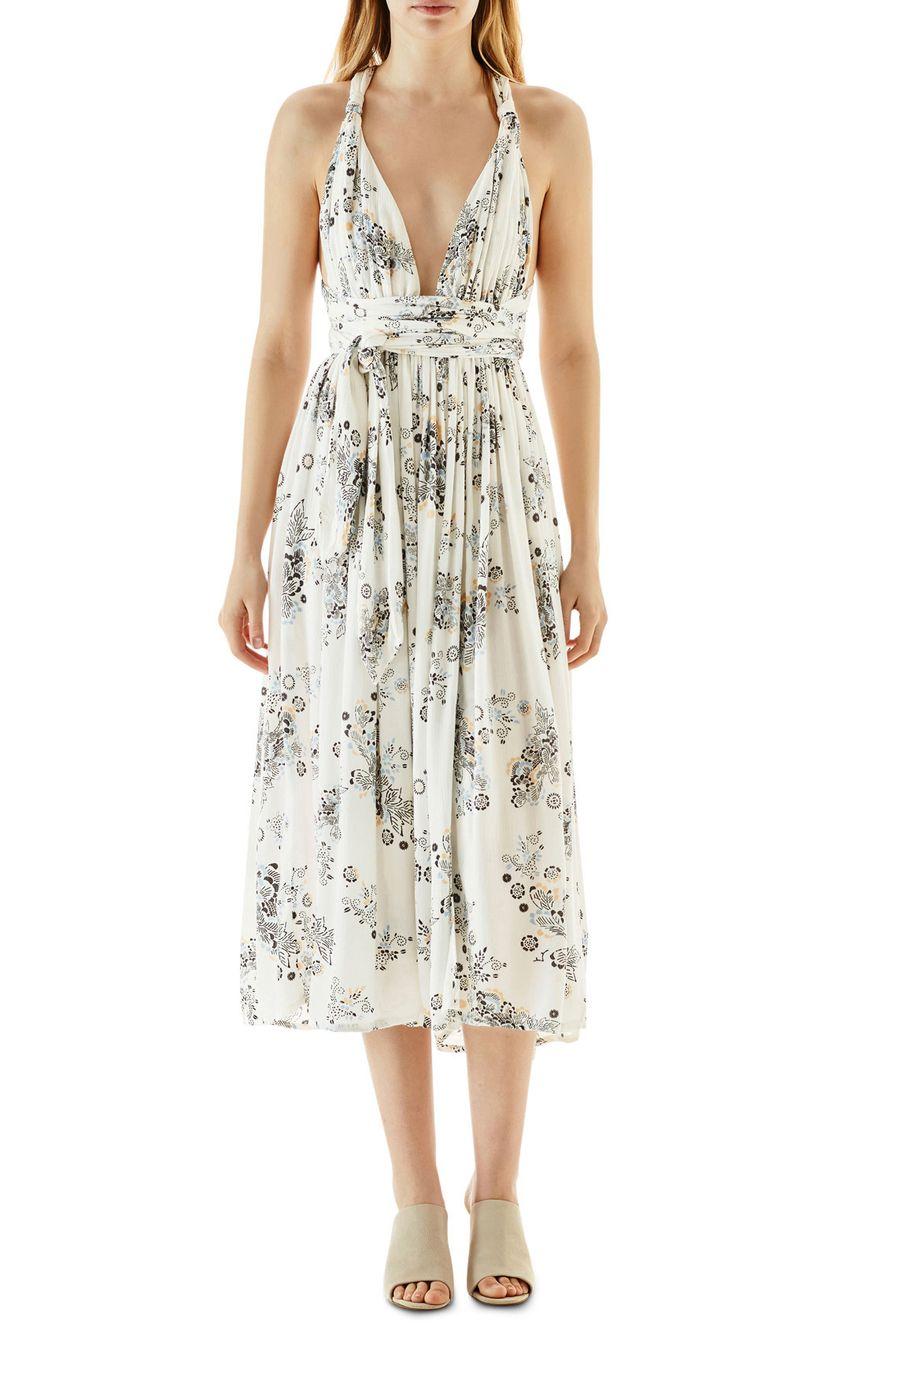 Halter maxi dress australia